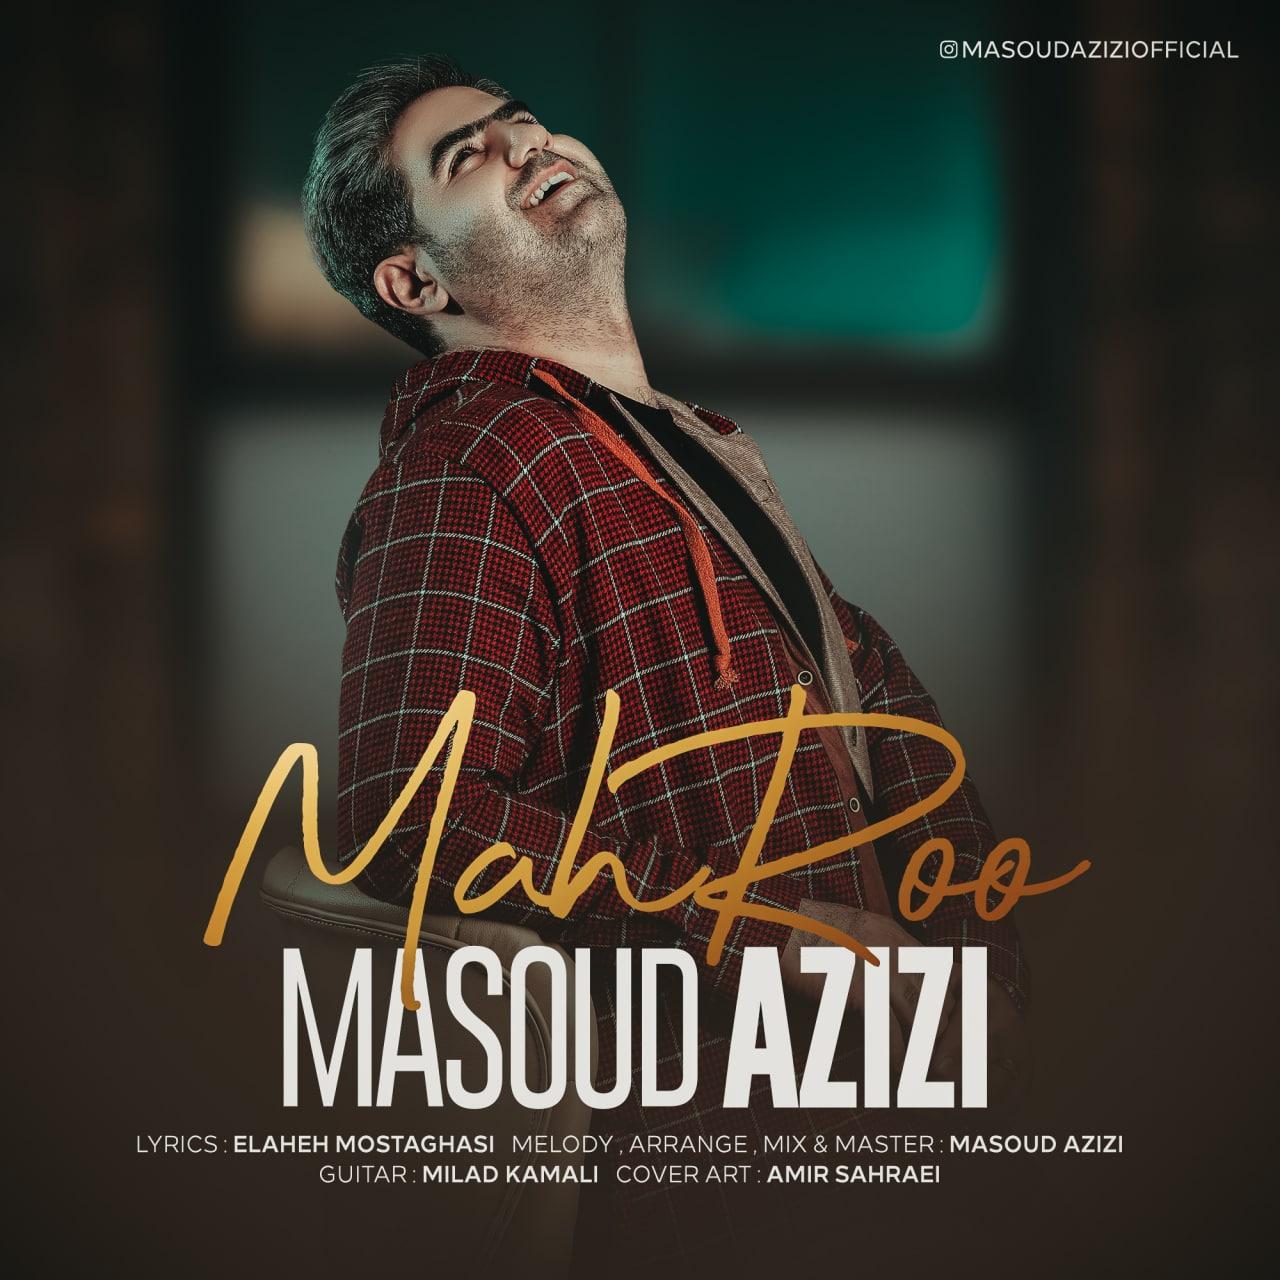 Masoud Azizi – Mahroo